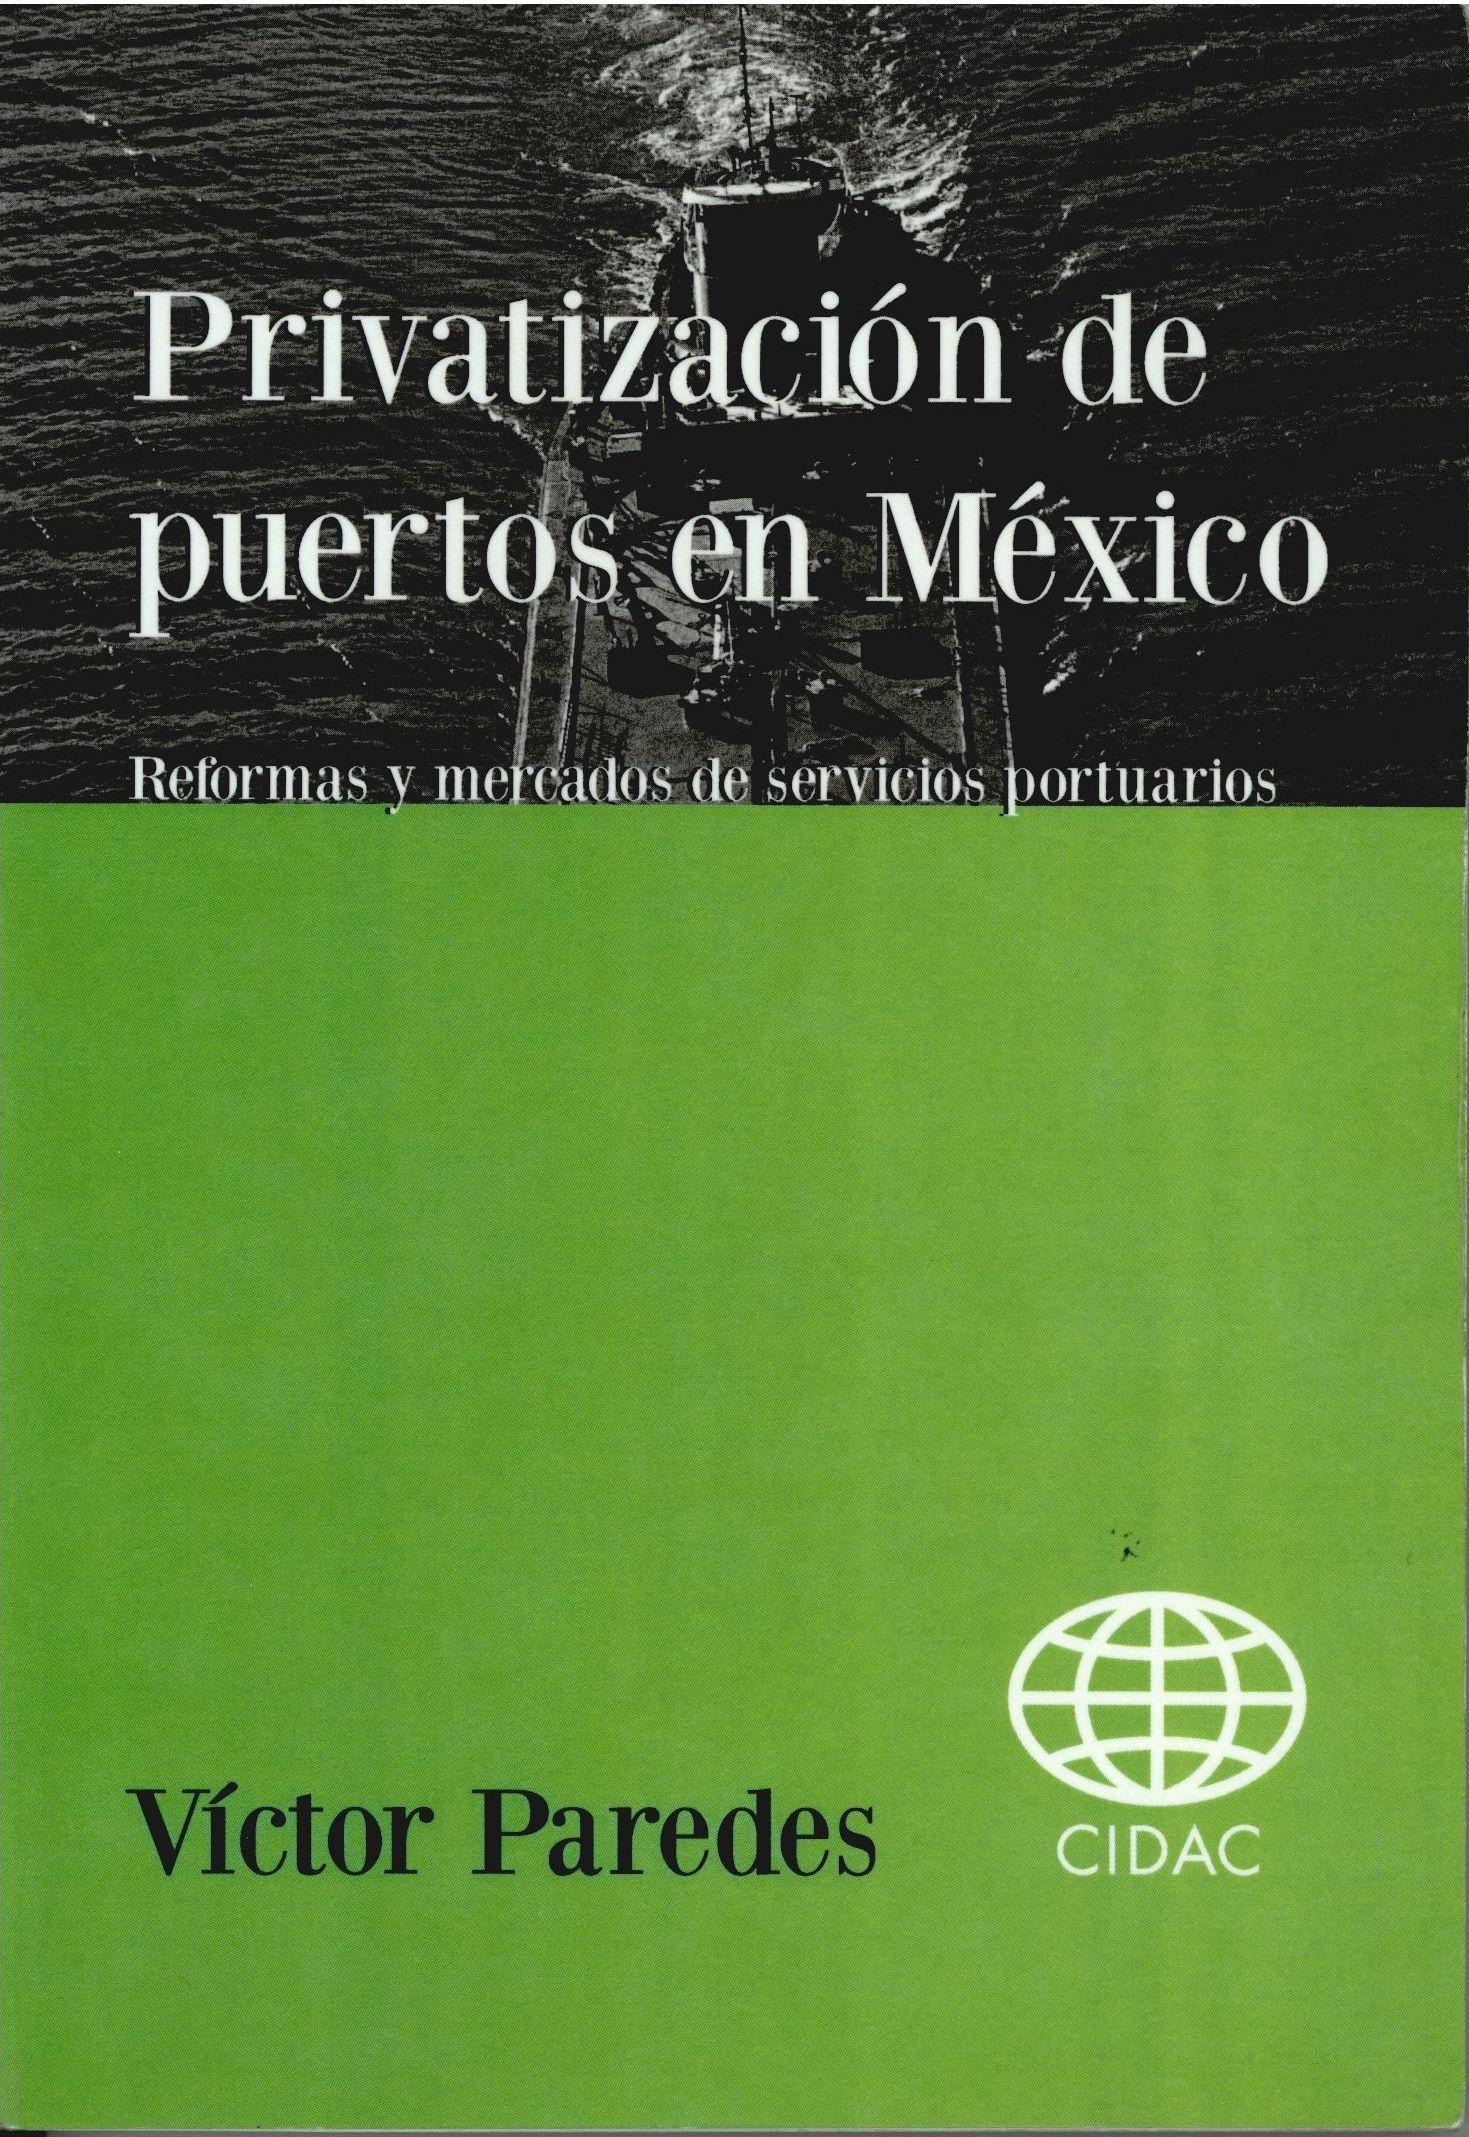 Privatizacion de puertos en Mexico/Ports privatization in Mexico